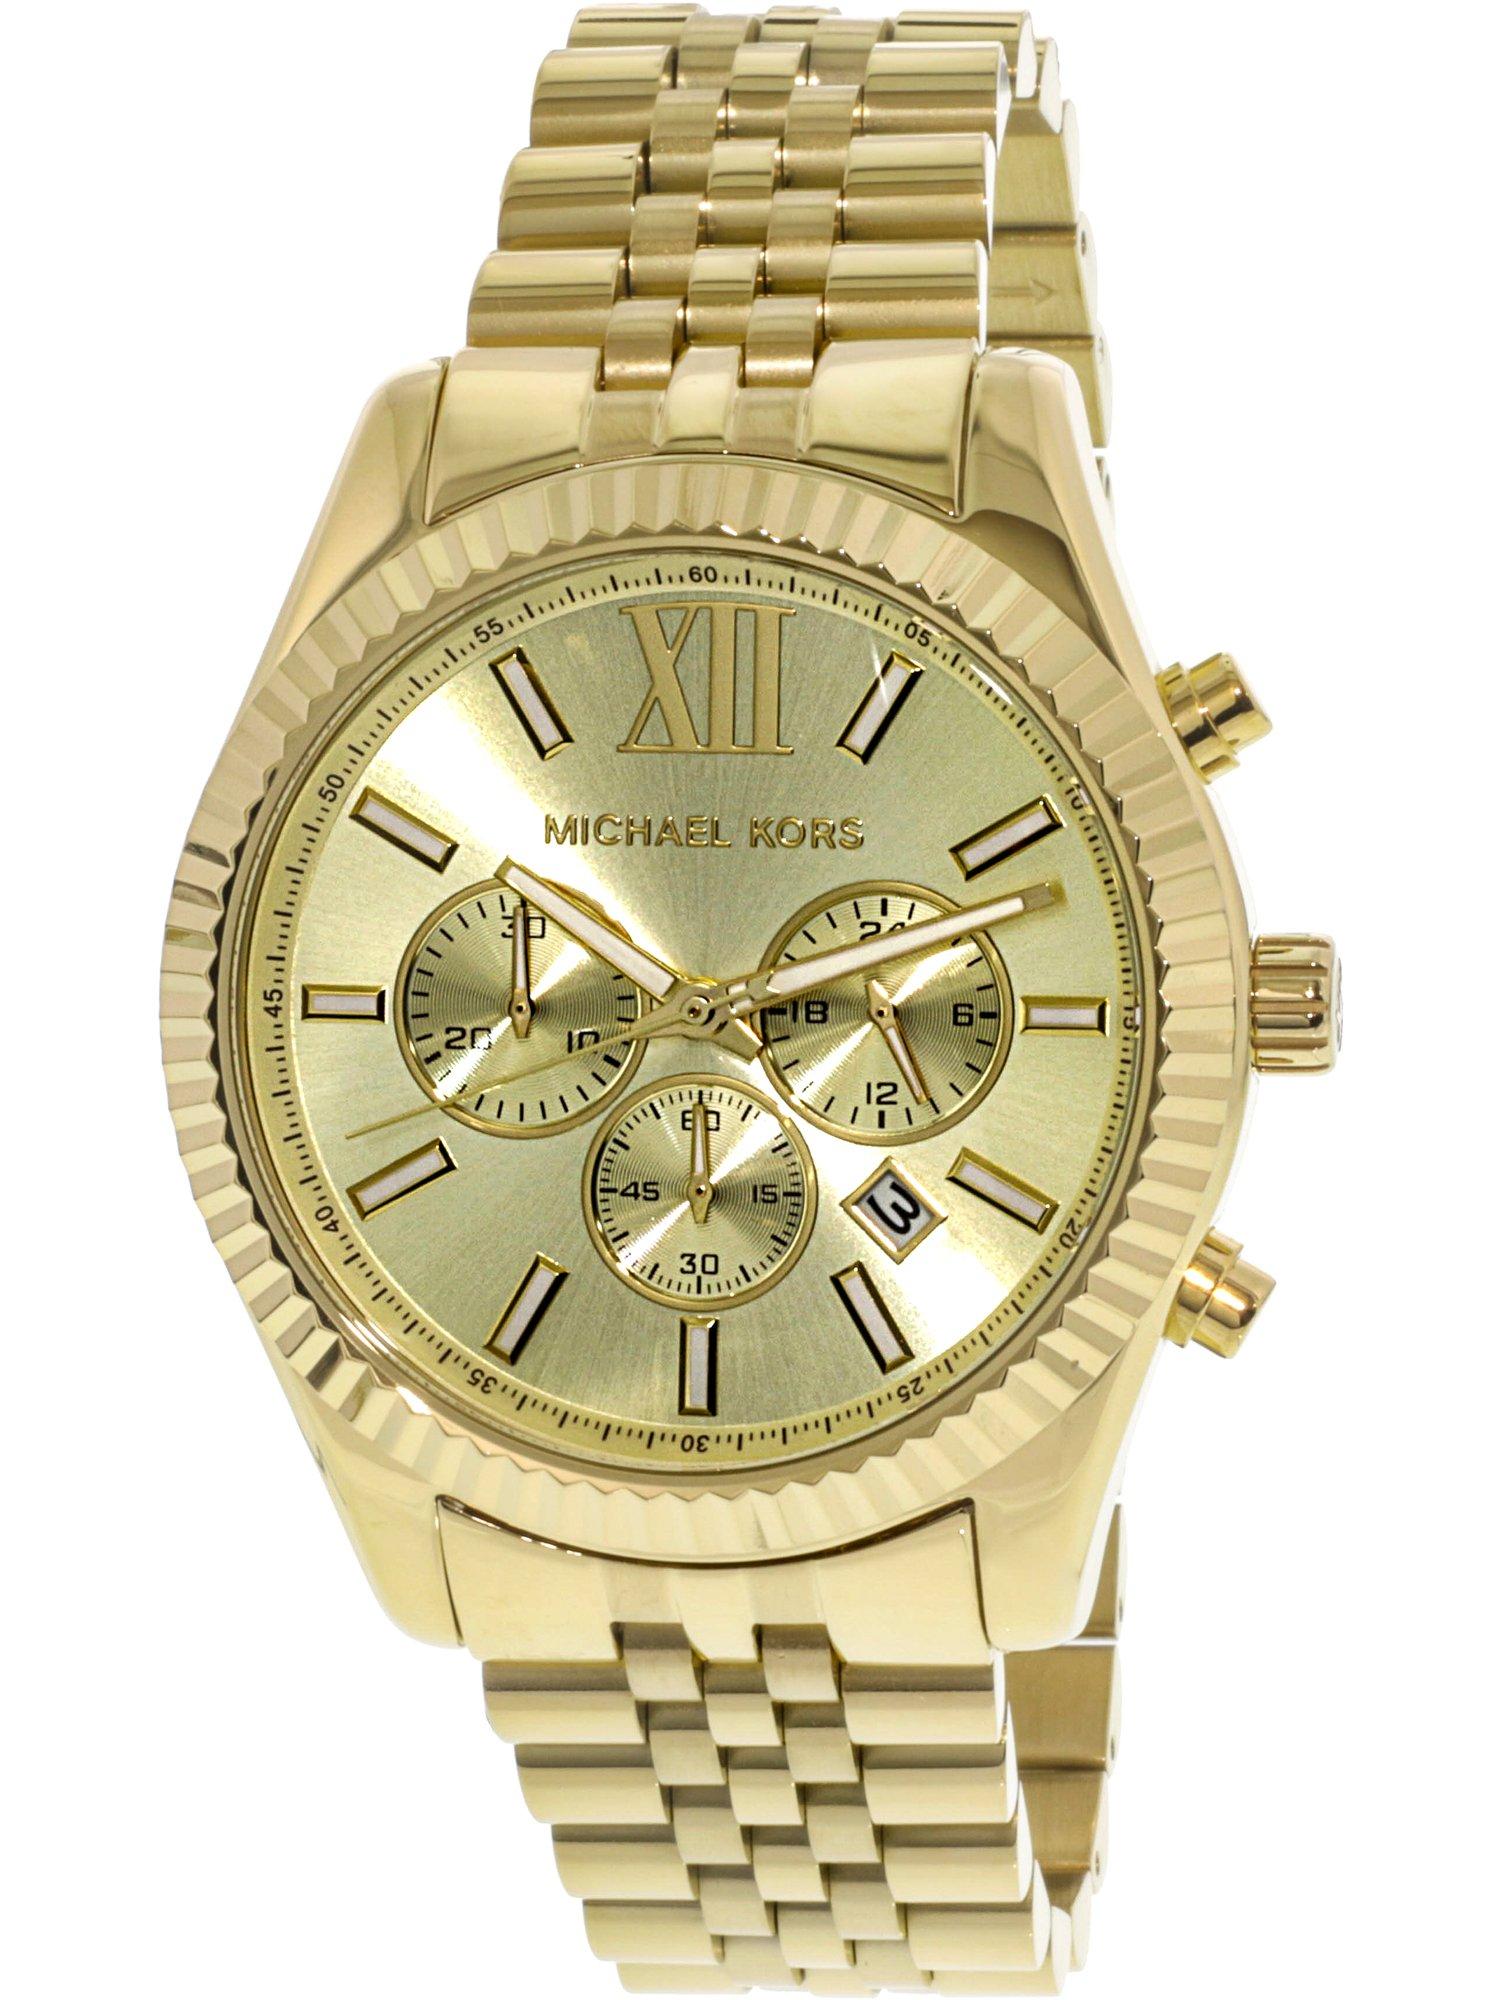 Michael Kors Men's Lexington Gold-Tone Chronograph Watch, MK8281